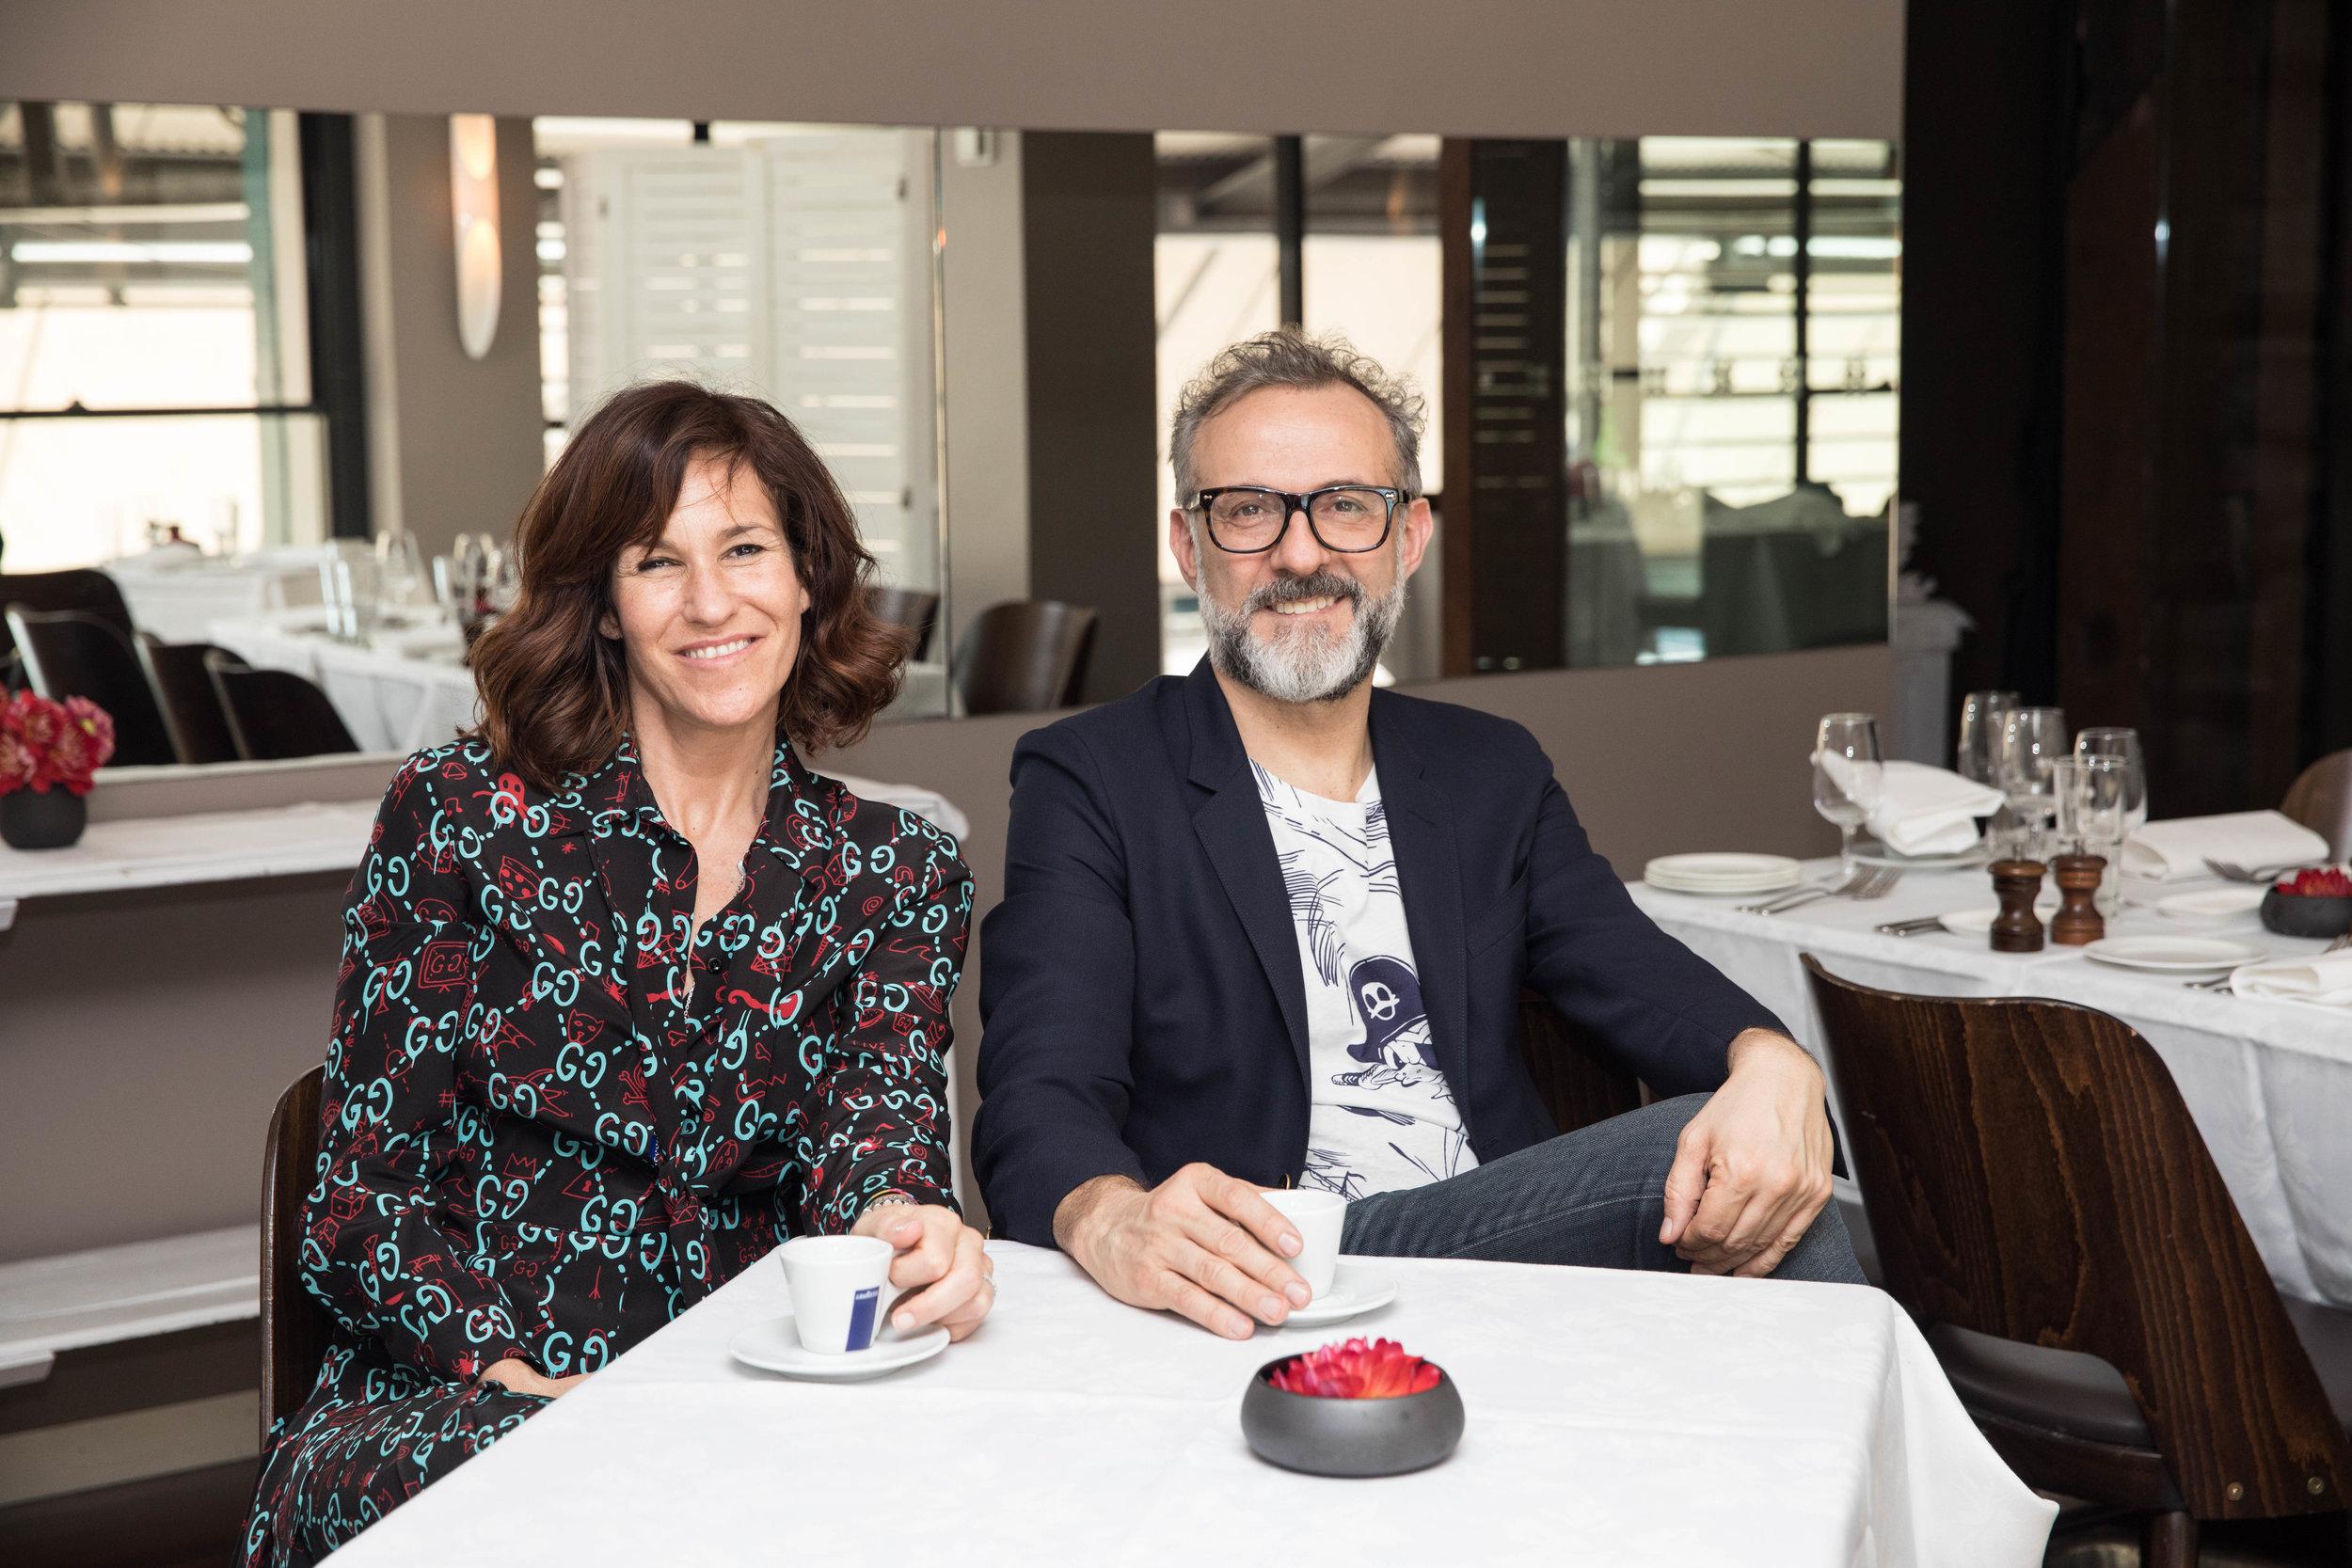 lavazza-massimo-bottura-worlds-50-best-restaurants-awards-2017-lara-2.jpg